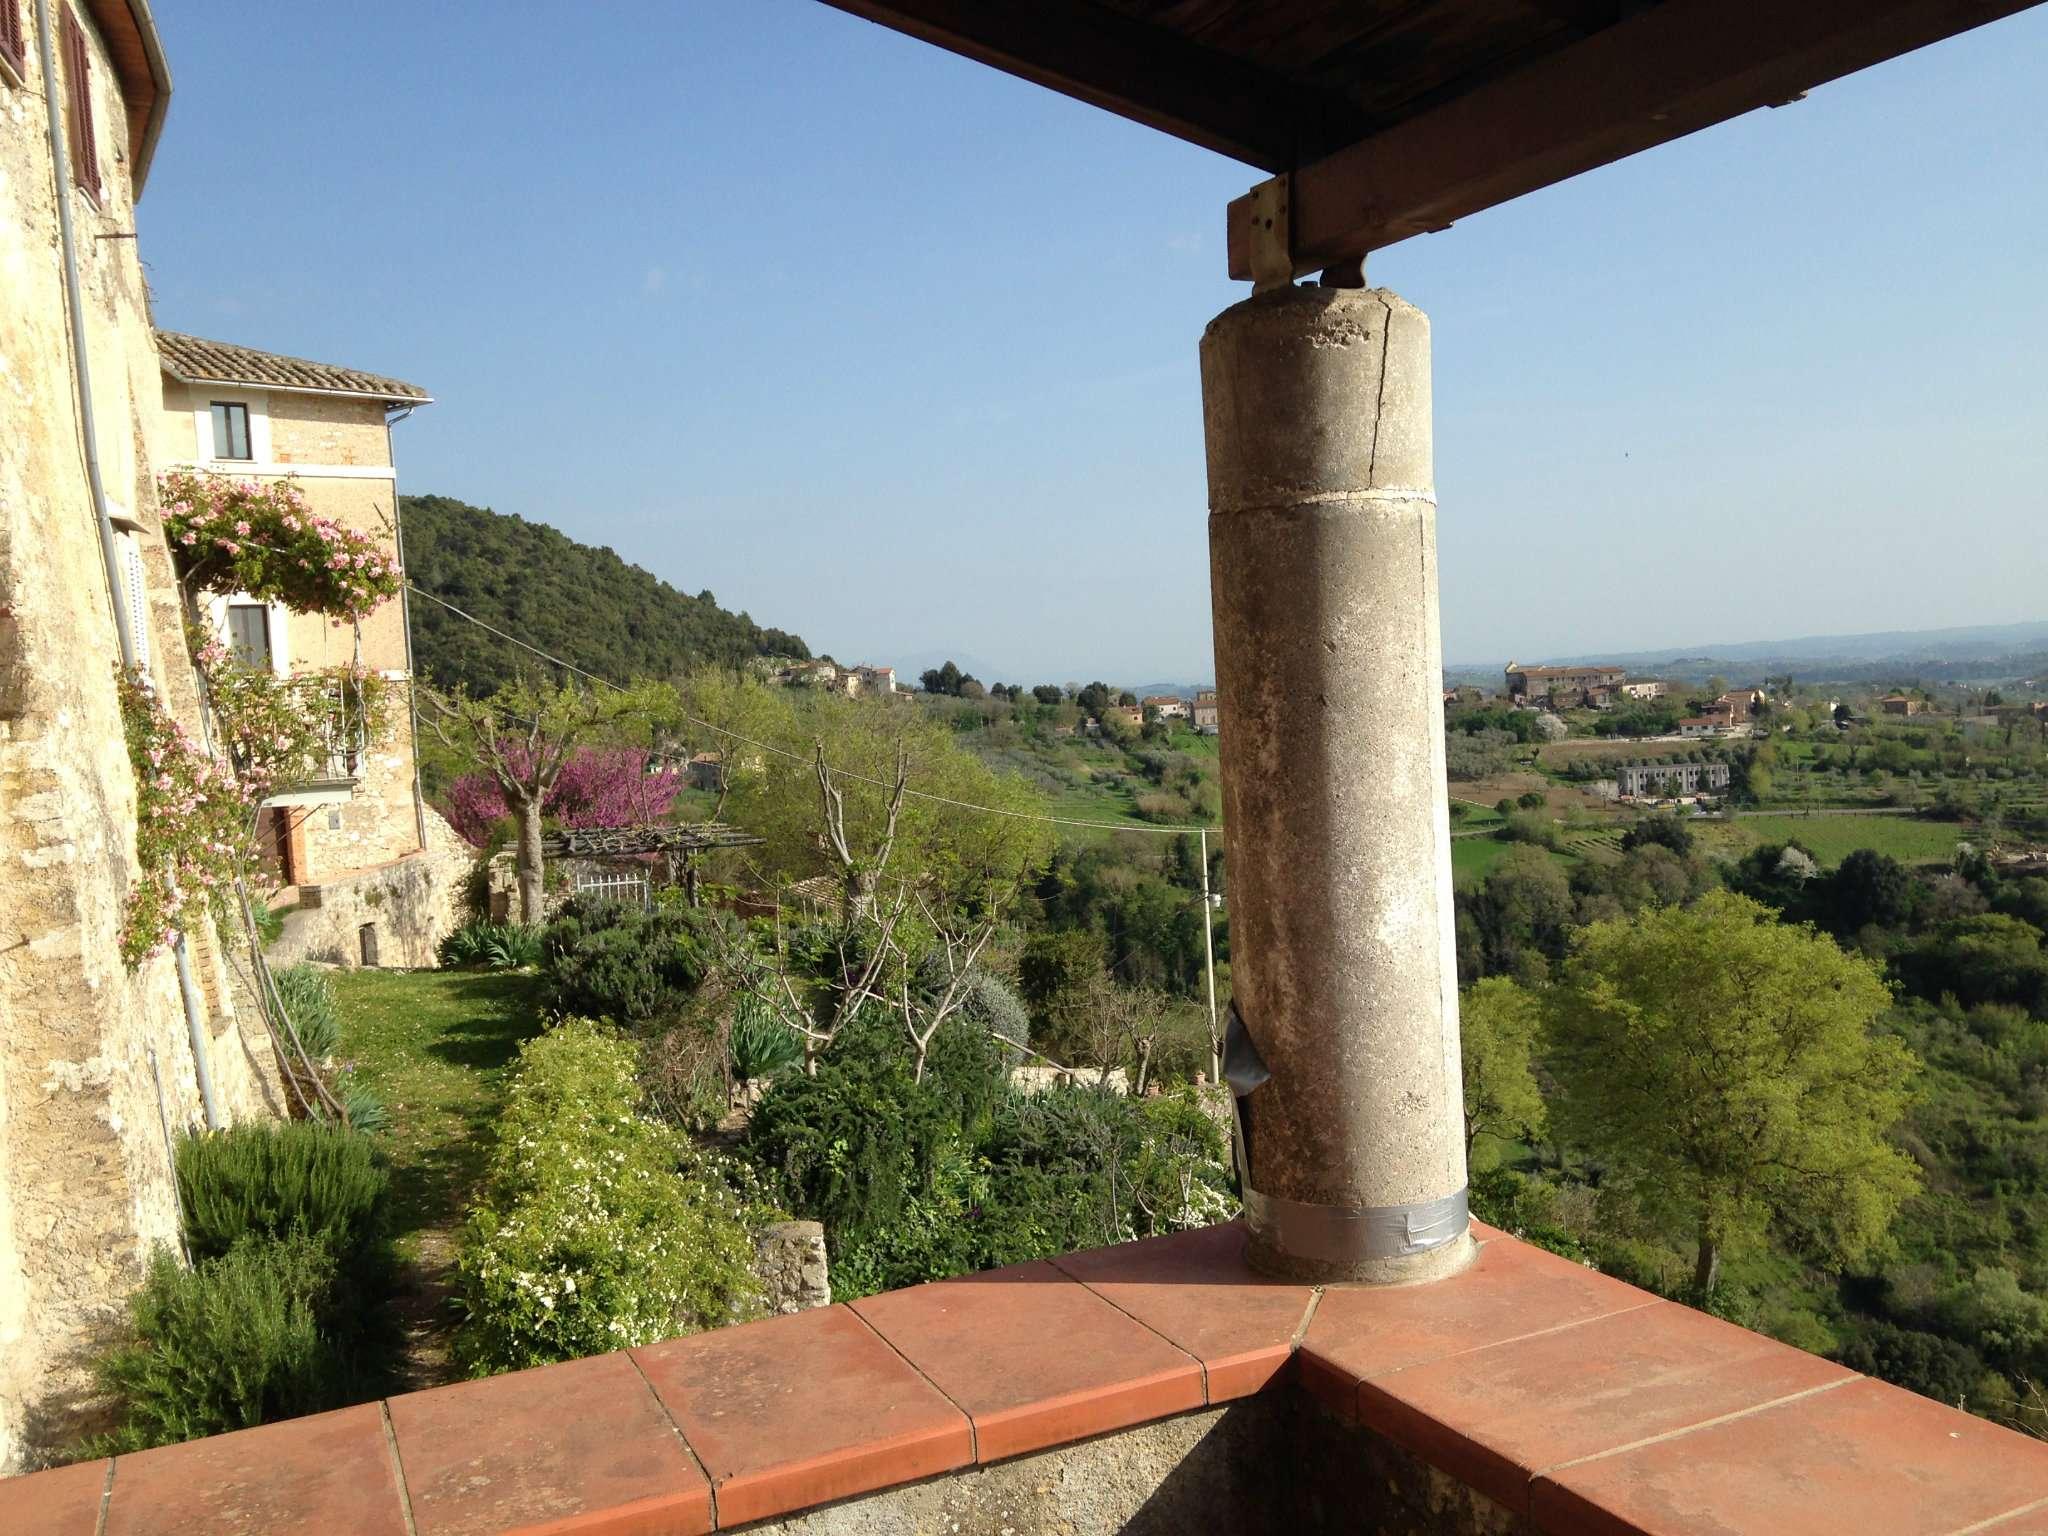 Quadrilocale in affitto a Calvi dell'Umbria in Borgo Calvi Dell'umbria